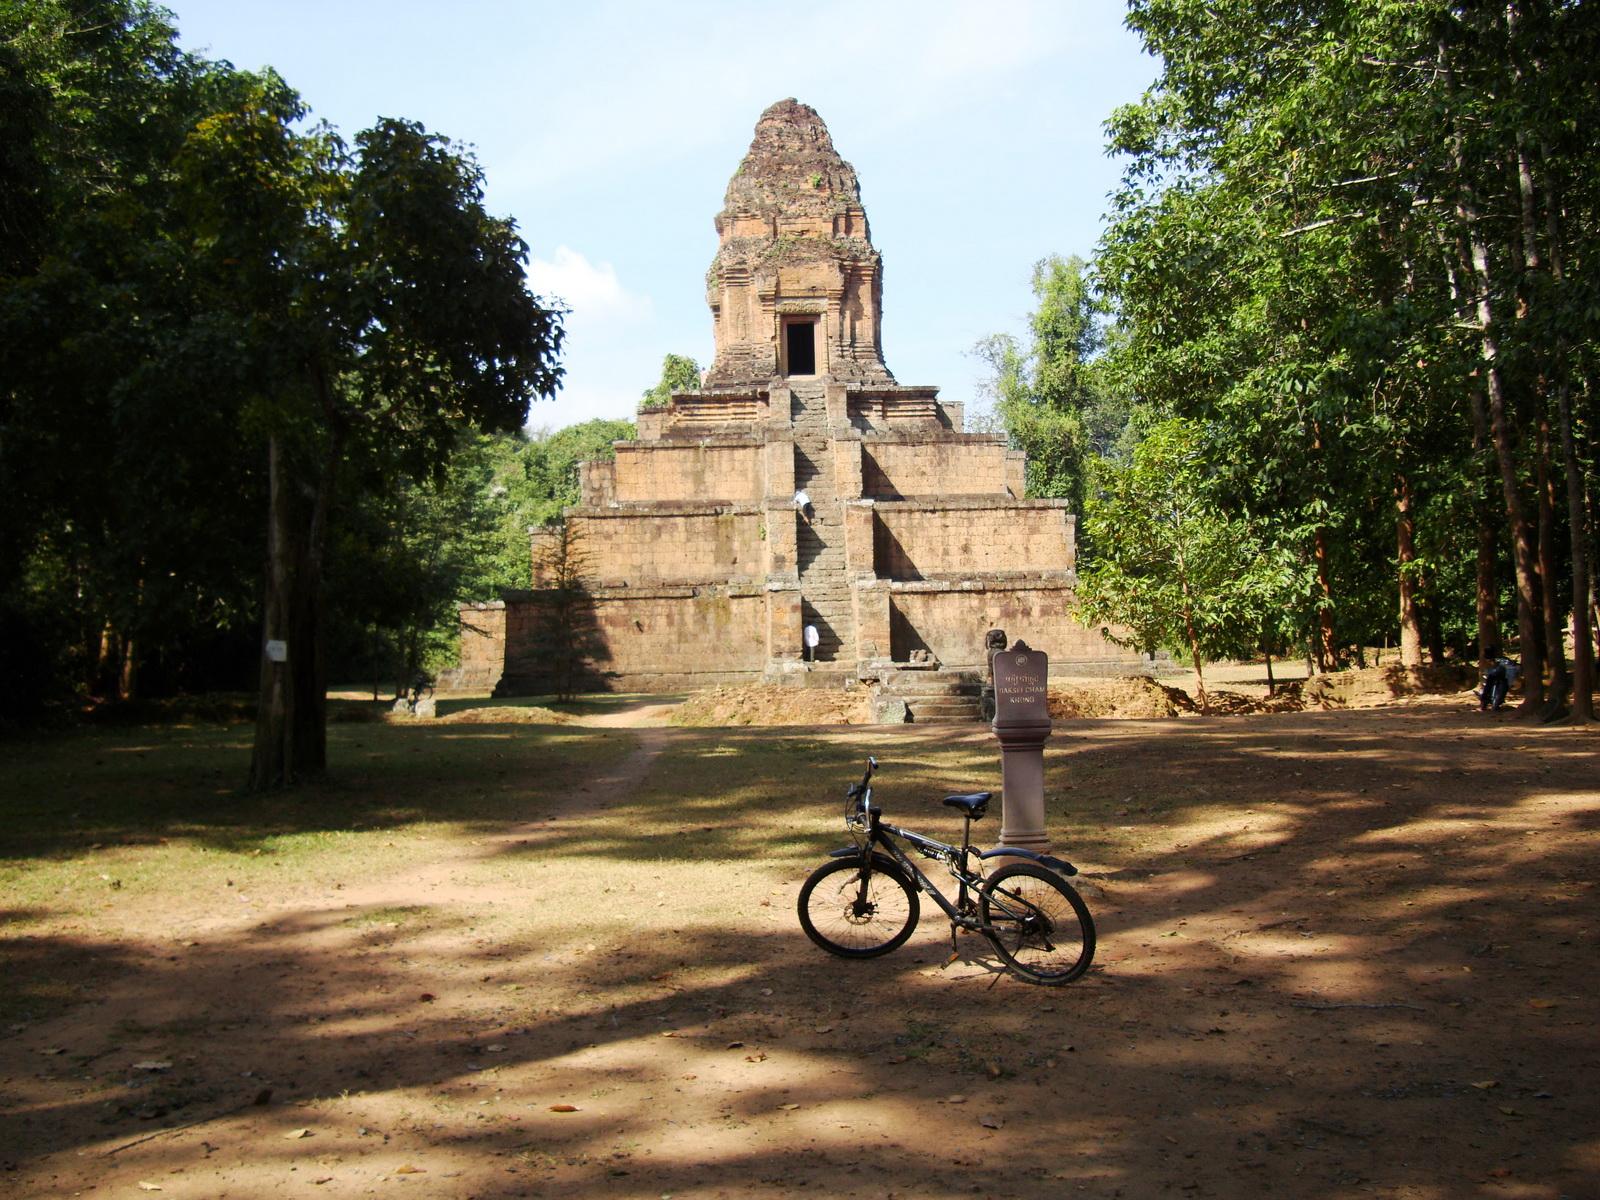 Baksei Chamkrong Temple Angkor Siem Reap Cambodia Jan 2010 06